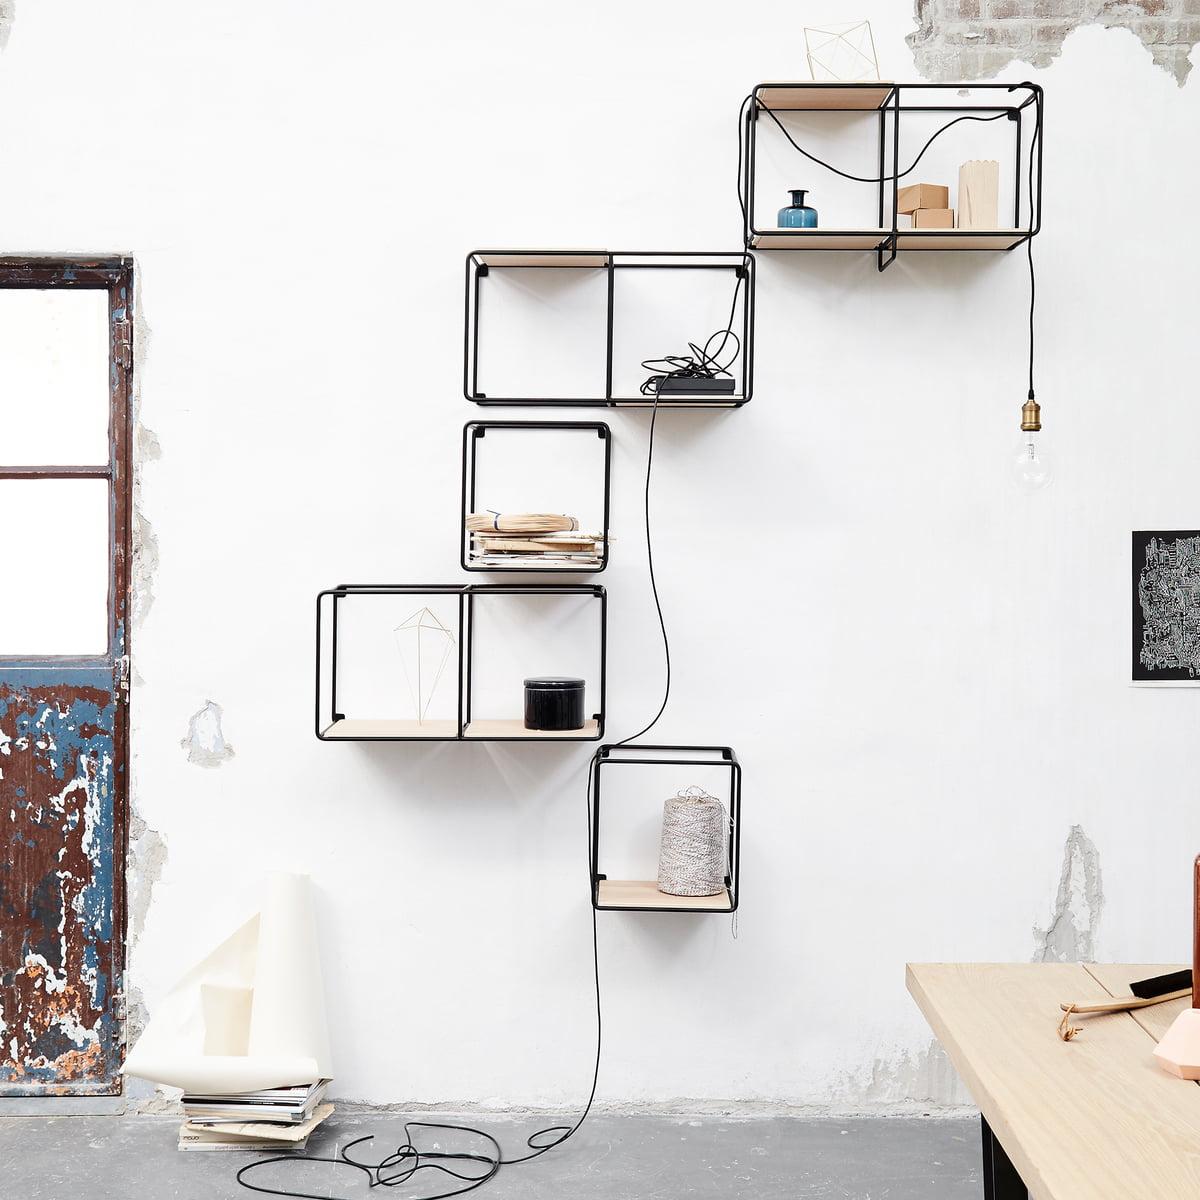 anywhere 1x1 wandregal von korridor connox. Black Bedroom Furniture Sets. Home Design Ideas